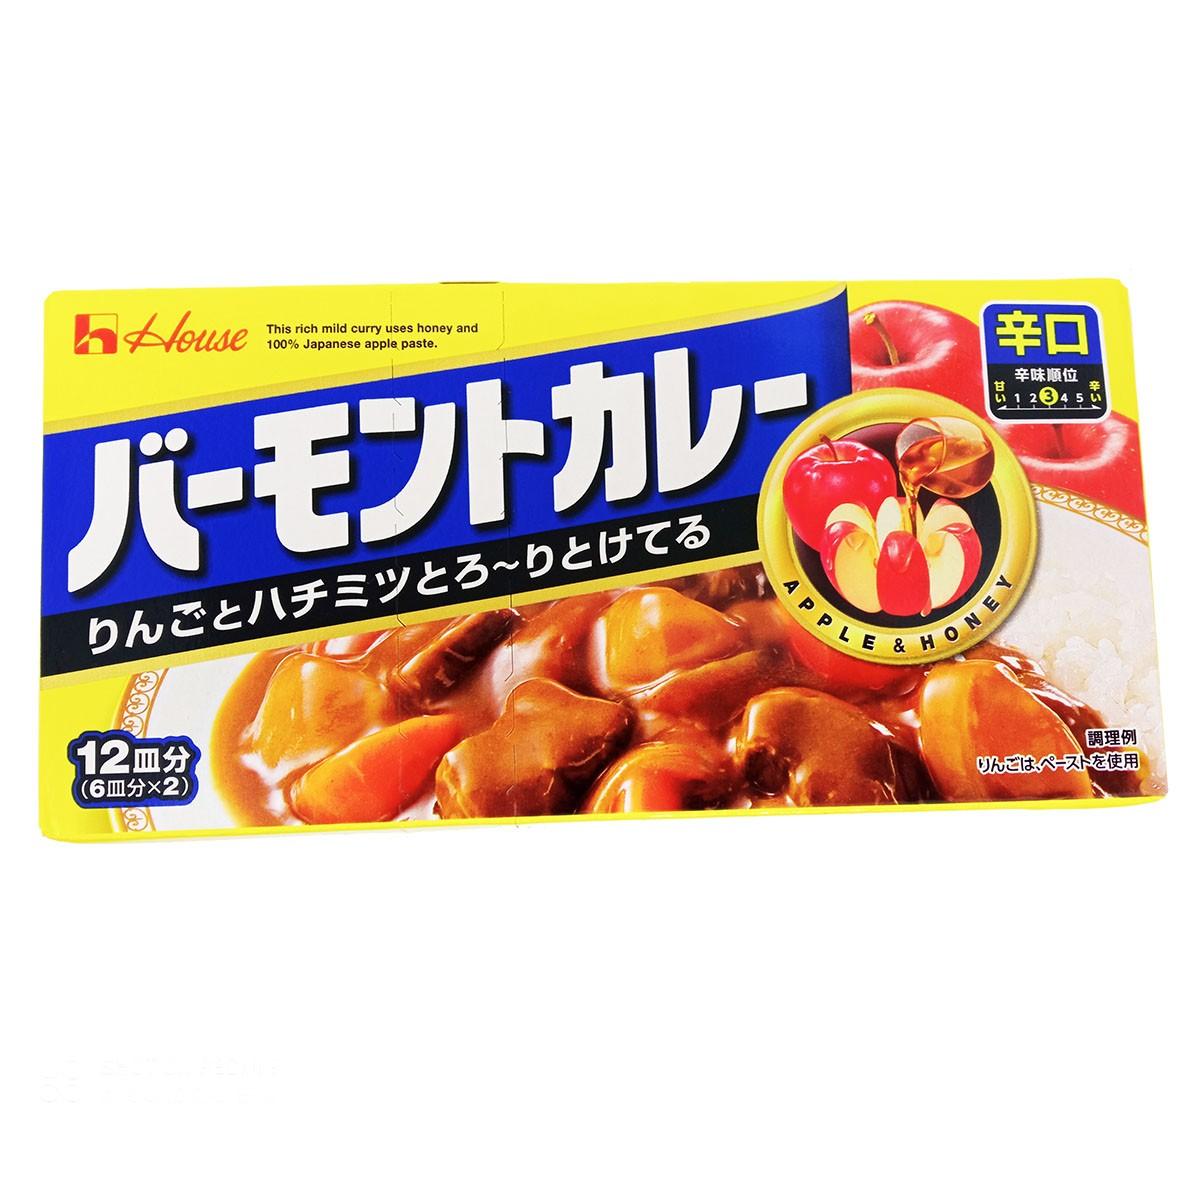 Curry Vermont Hot Karakuchi Maçã e Mel 230g - House